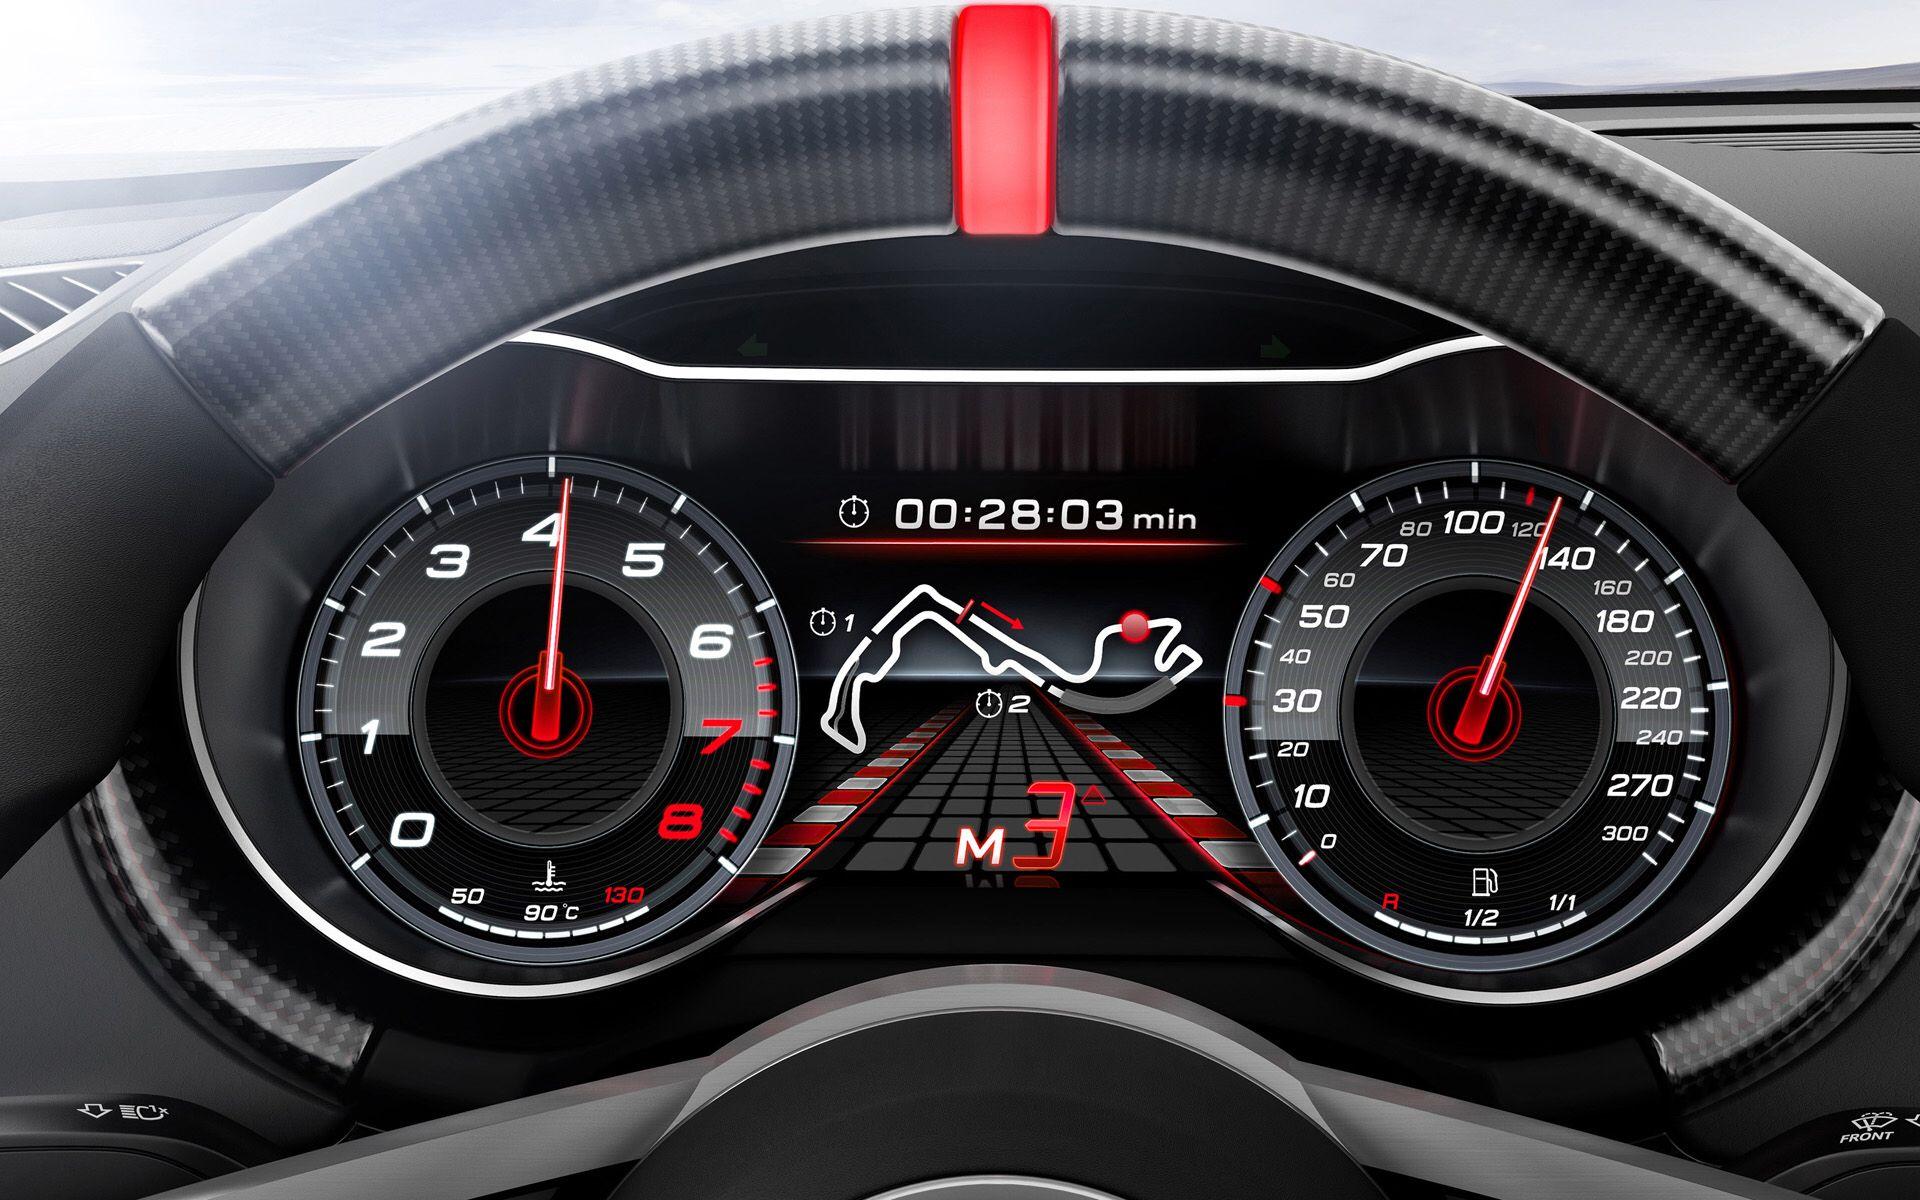 http://image.besttechcars.com/2015/04/2015-Acura-NSX-Top-Speed ...